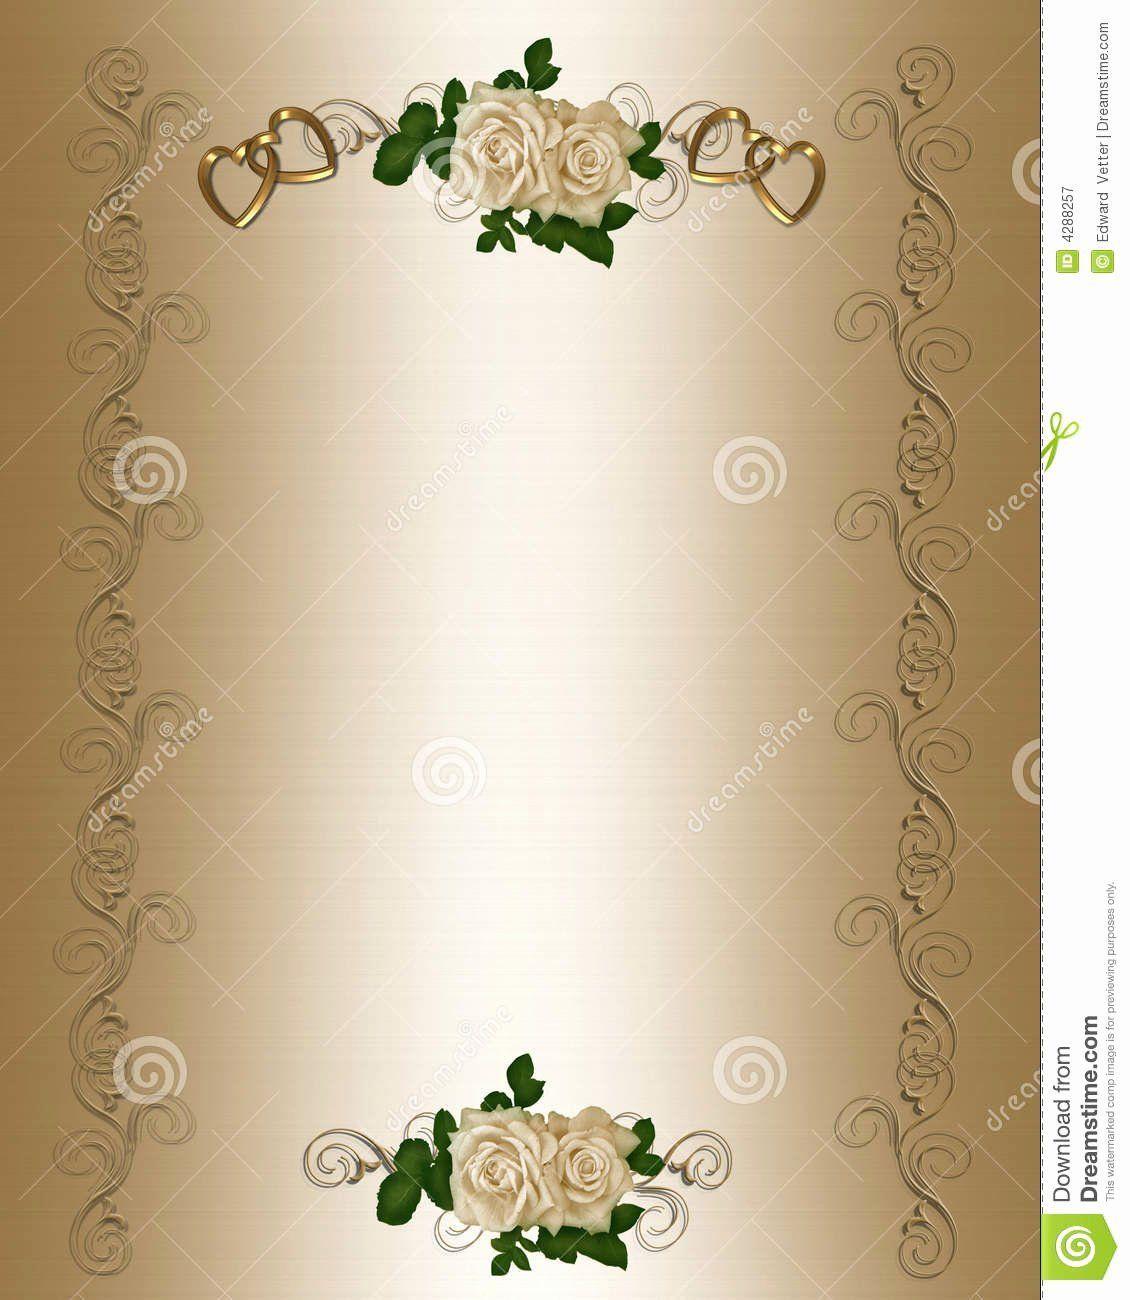 008 Phenomenal 50th Anniversary Invitation Template Free Download High Resolution  Golden WeddingFull